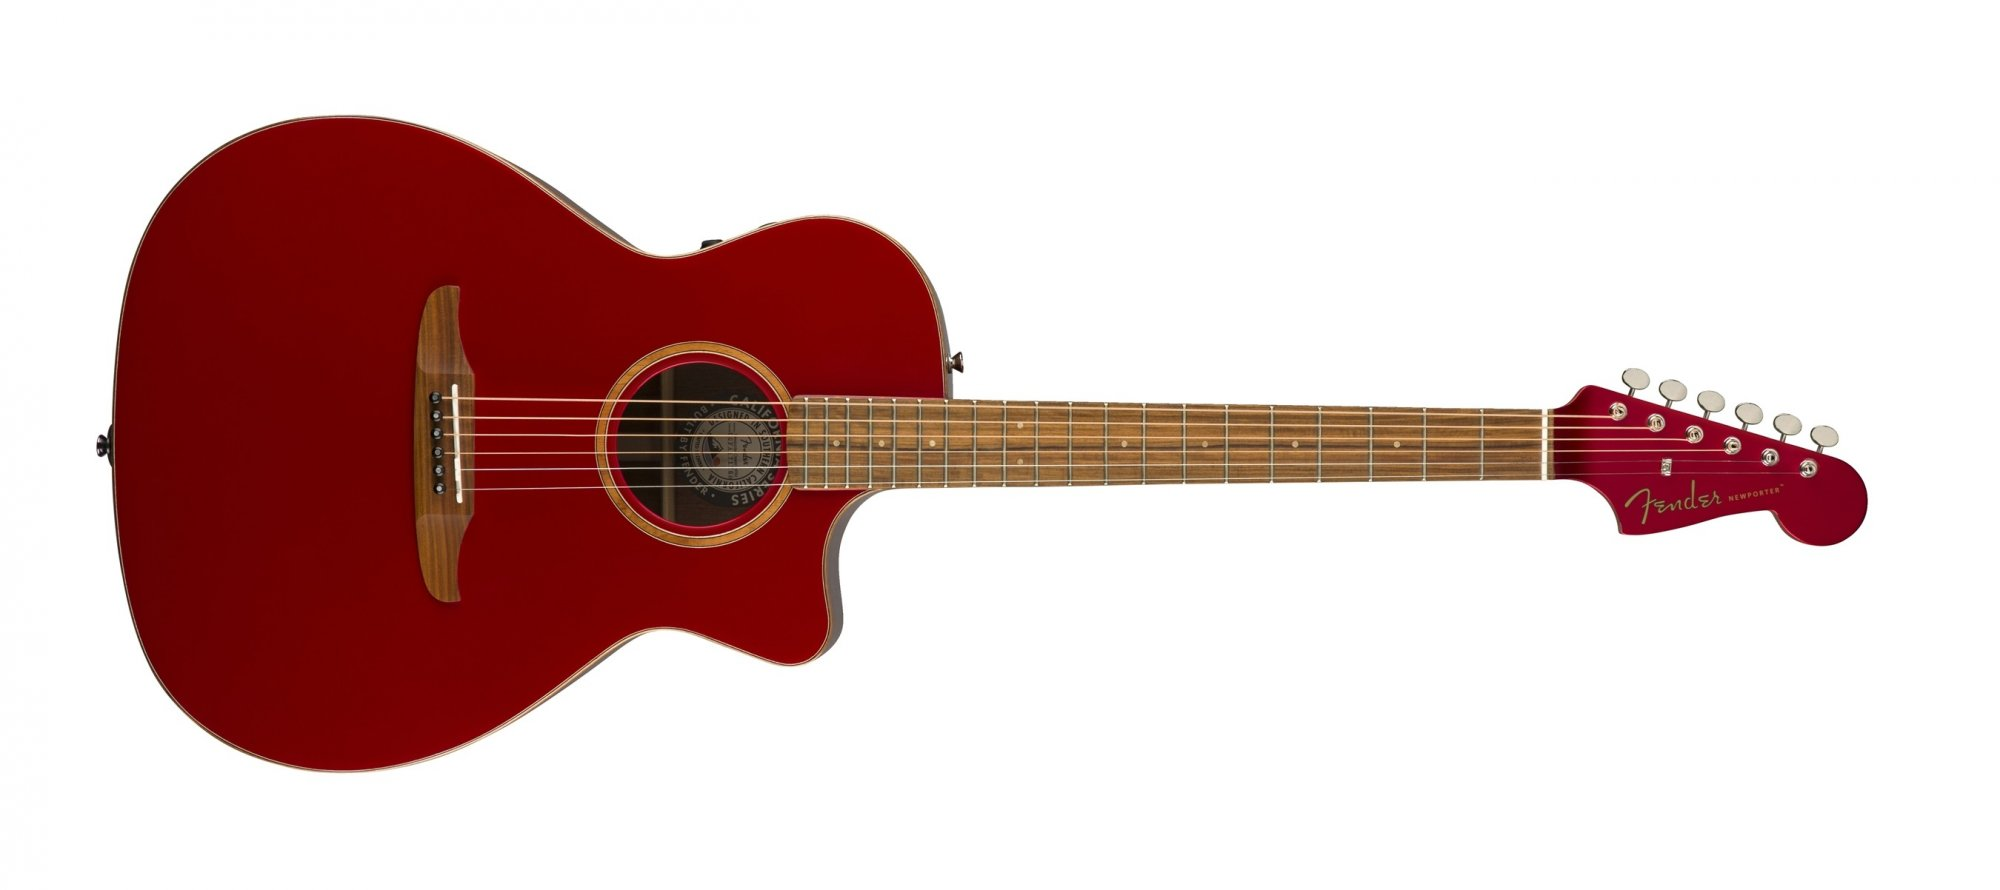 Fender Newporter Classic Acoustic Electric Guitar Hot Rod Red Metallic